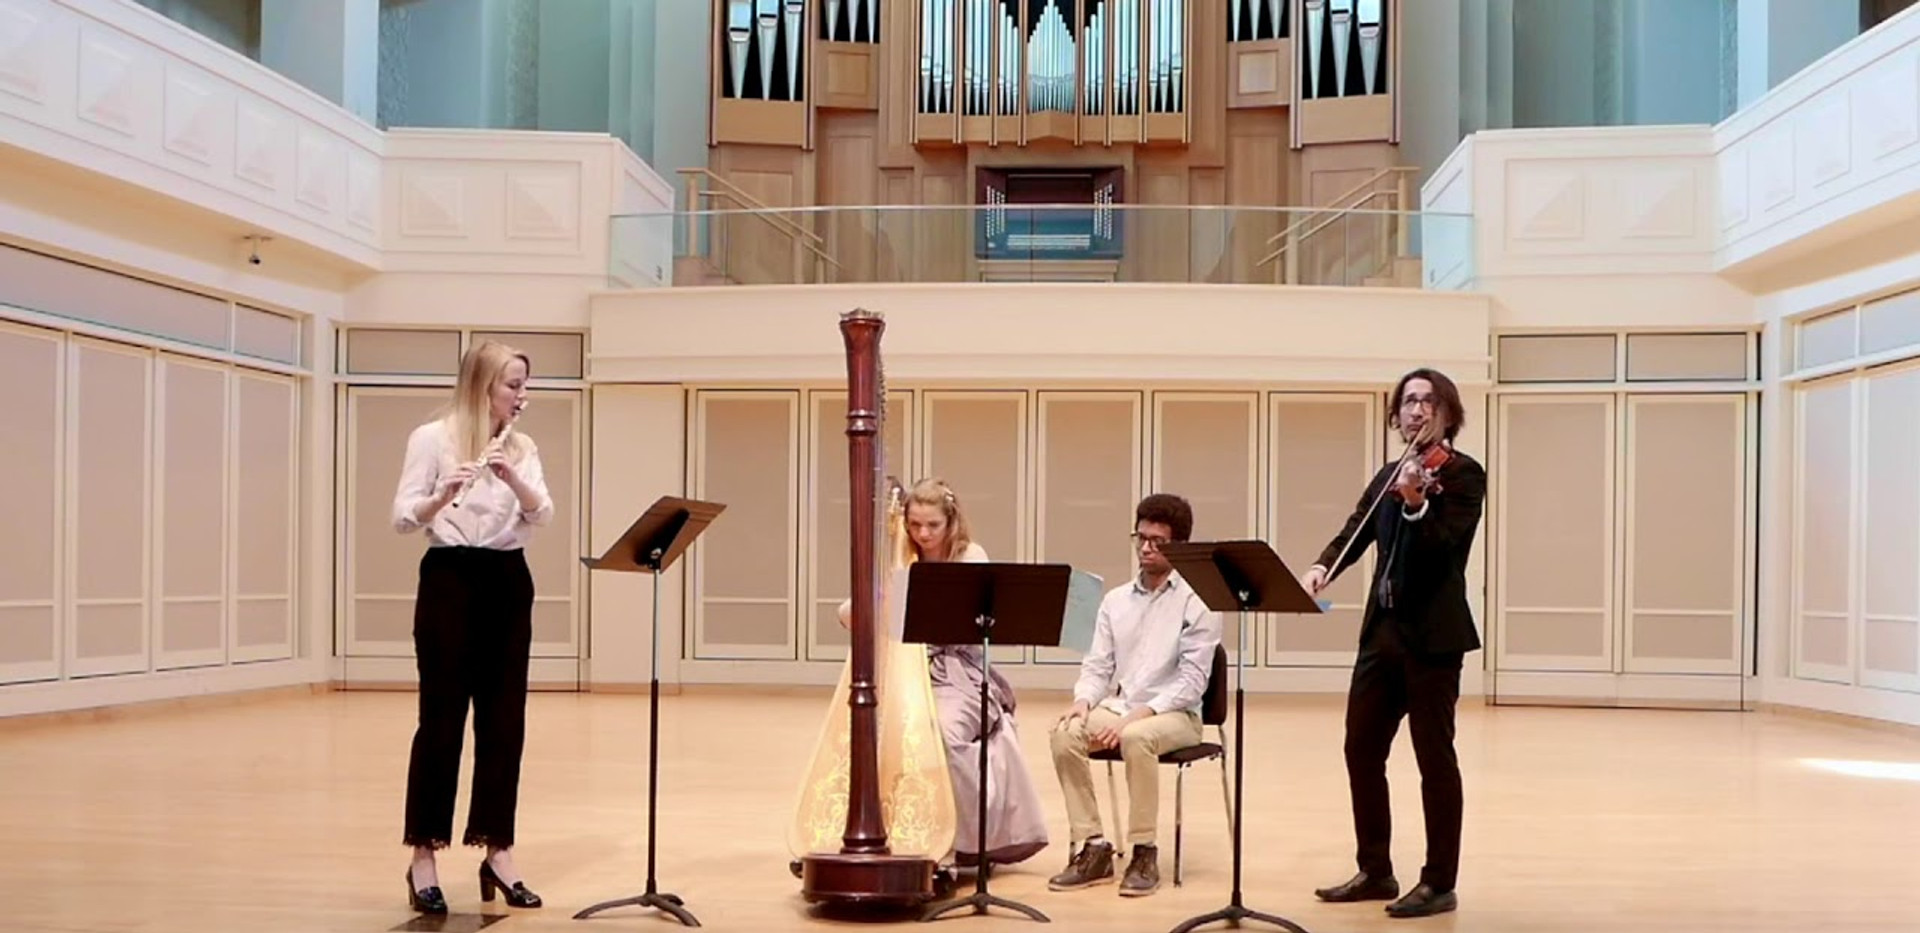 Ravel: Sonatine for flute, viola, and harp